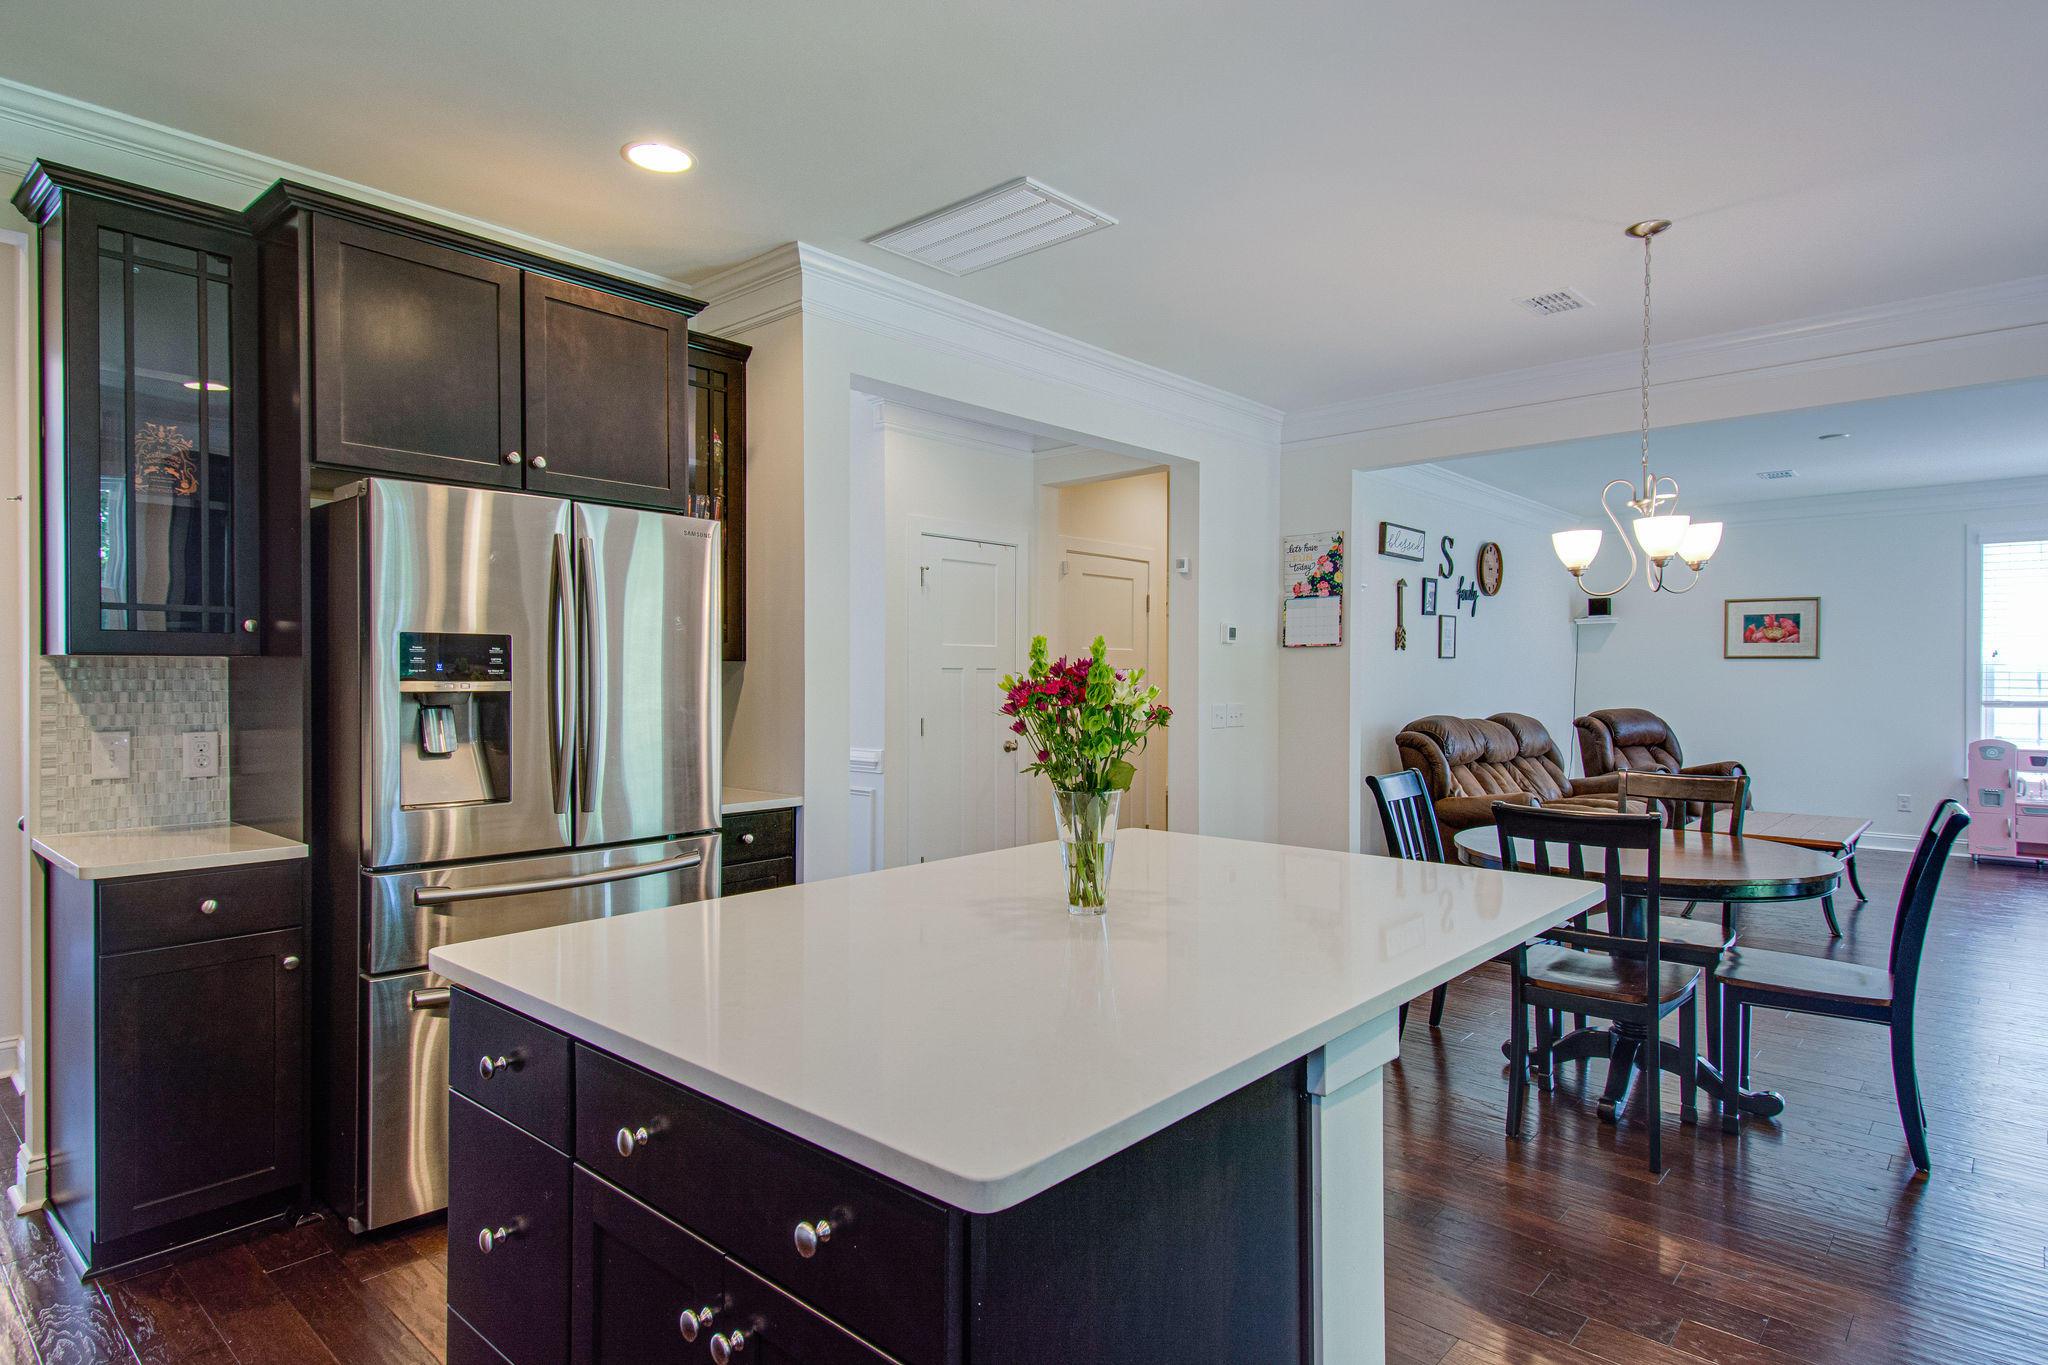 Magnolia Village Homes For Sale - 1261 Pearwood, Mount Pleasant, SC - 8